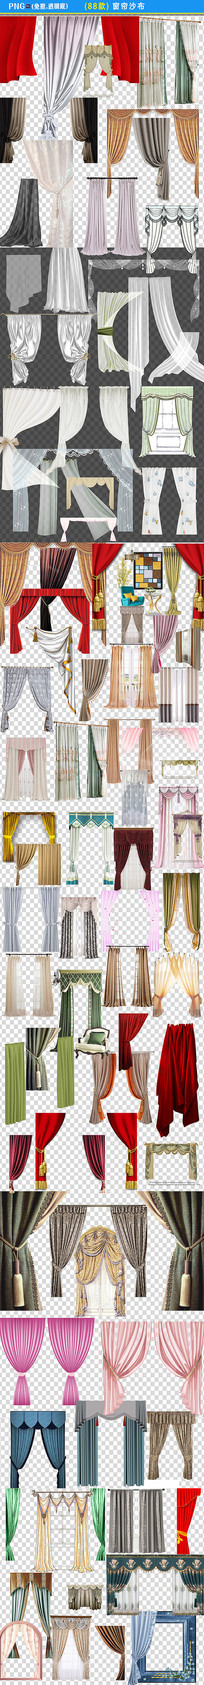 窗帘帘幕png素材